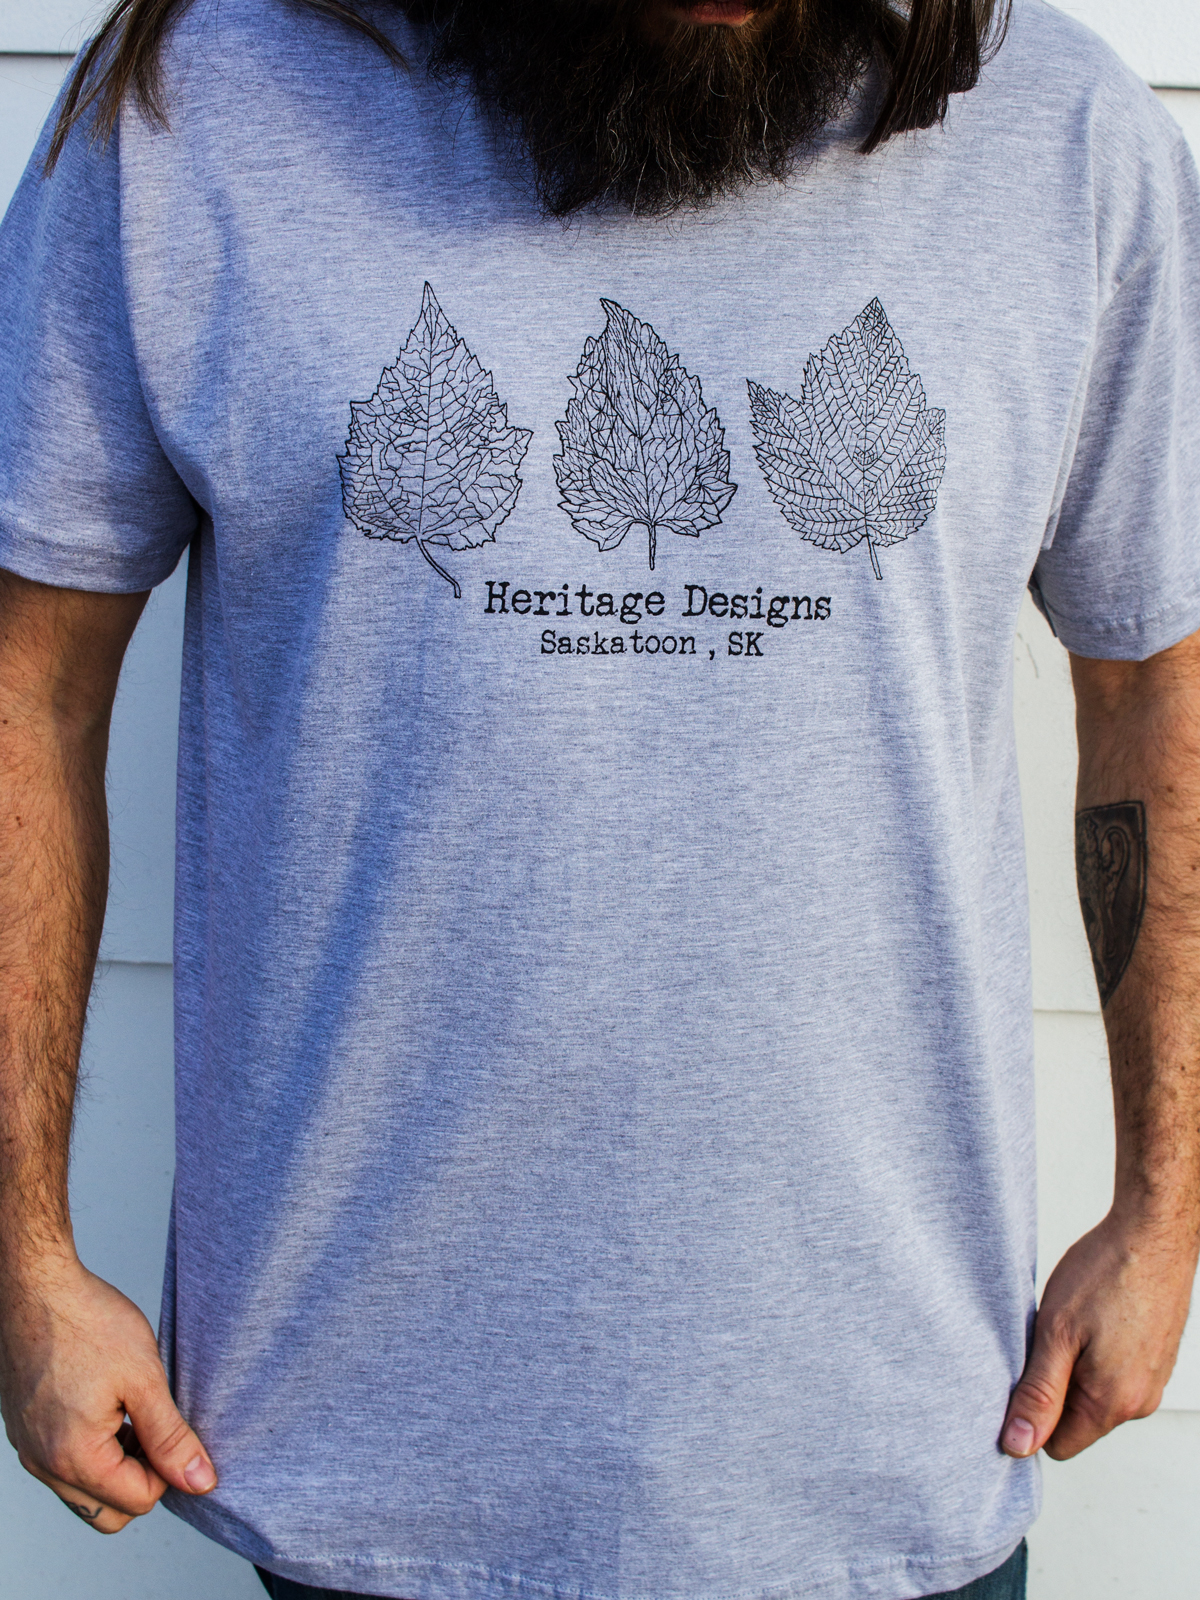 8b344adc Are Vistaprint T Shirts Good Quality - DREAMWORKS